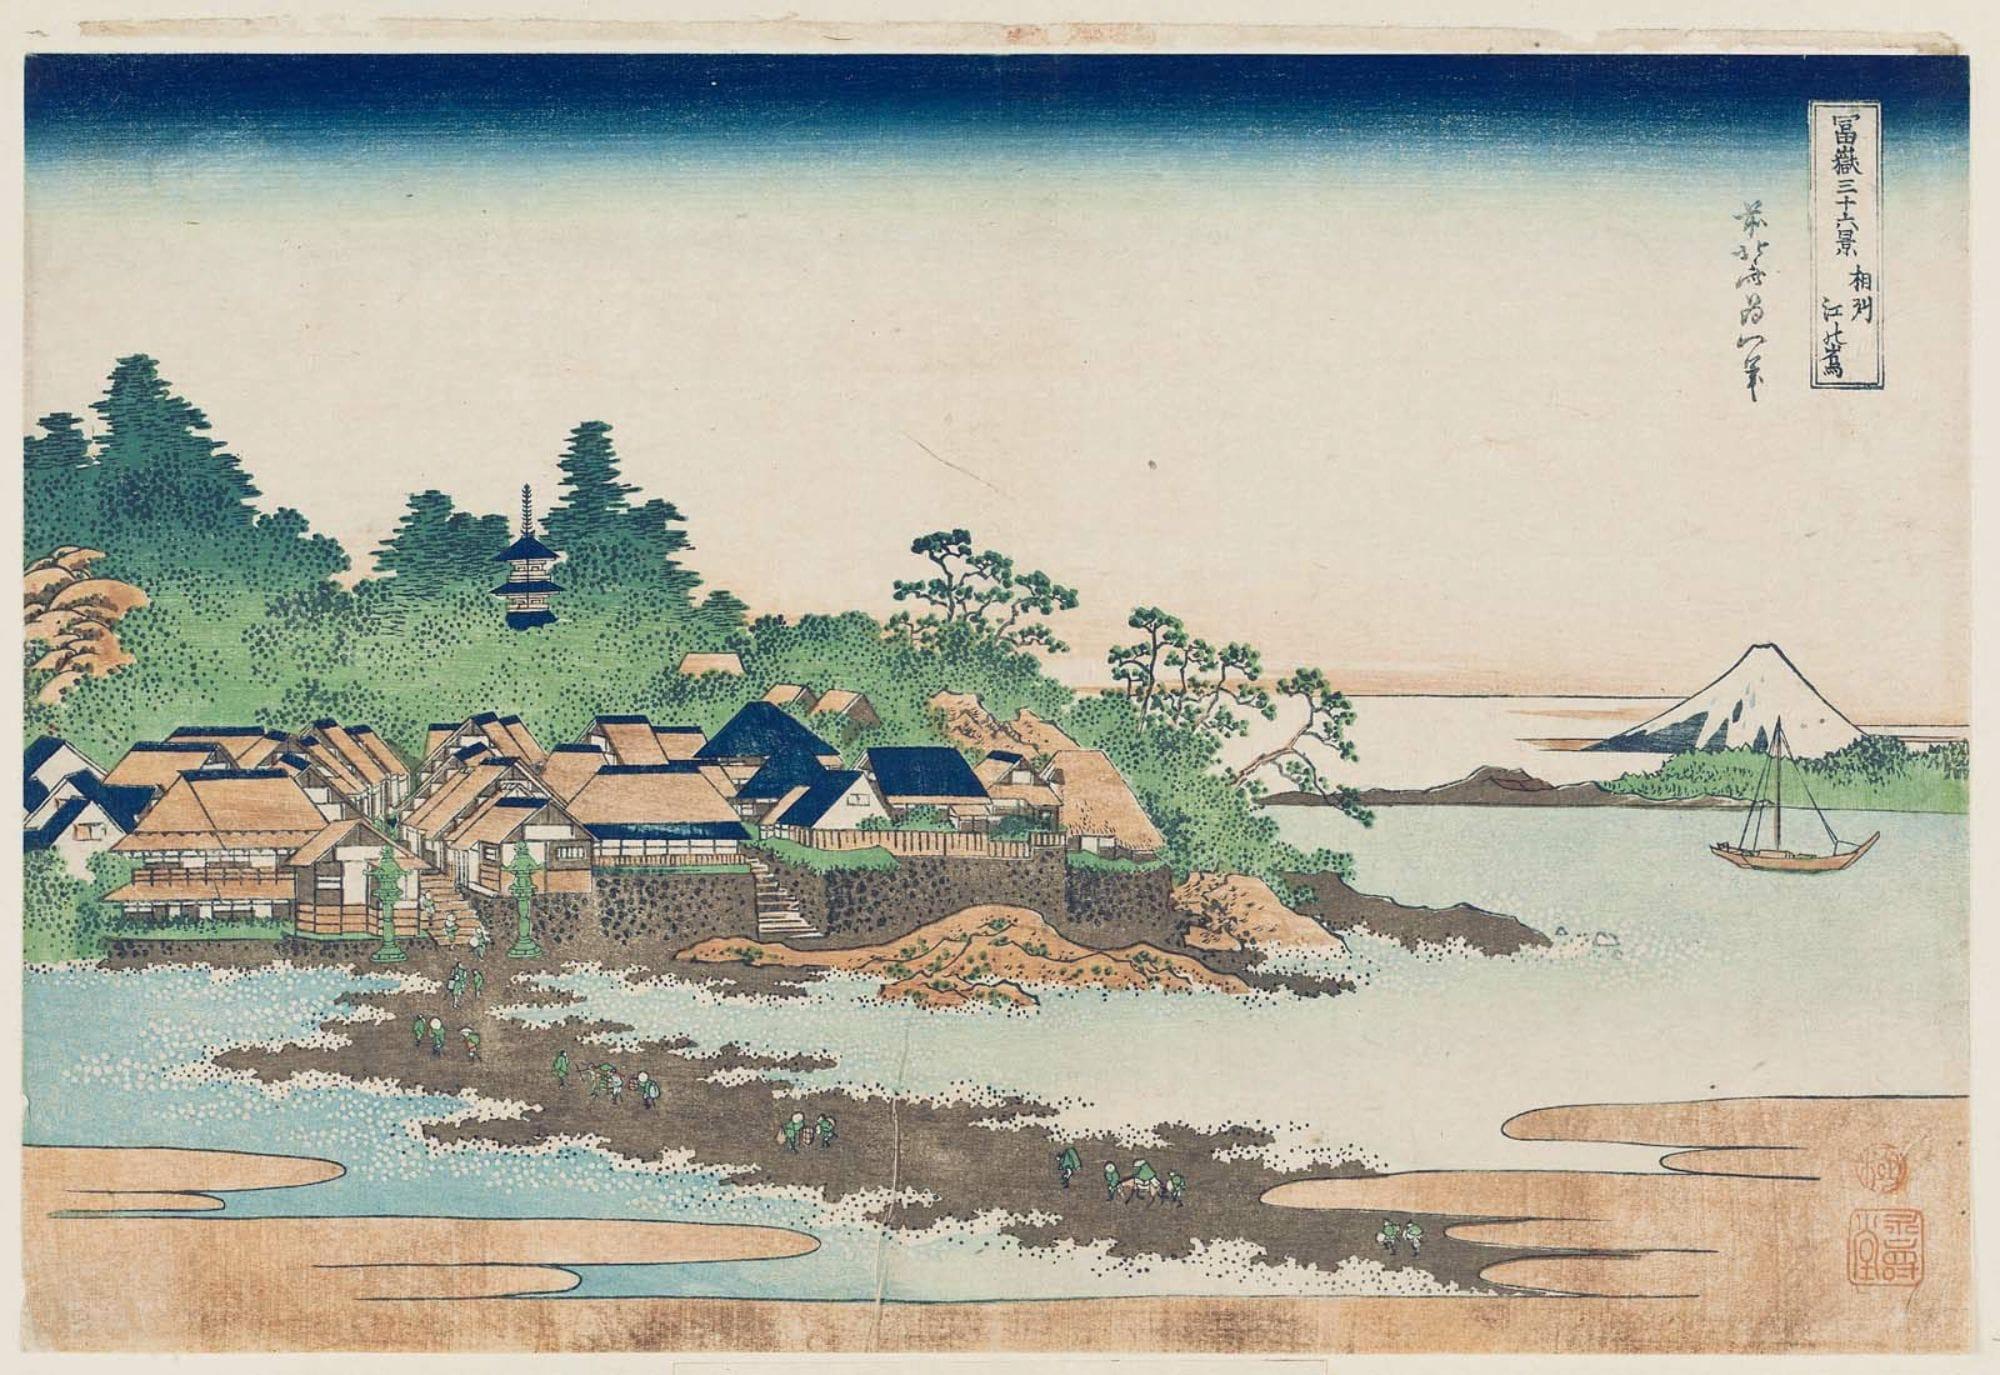 Peinture de Enoshima